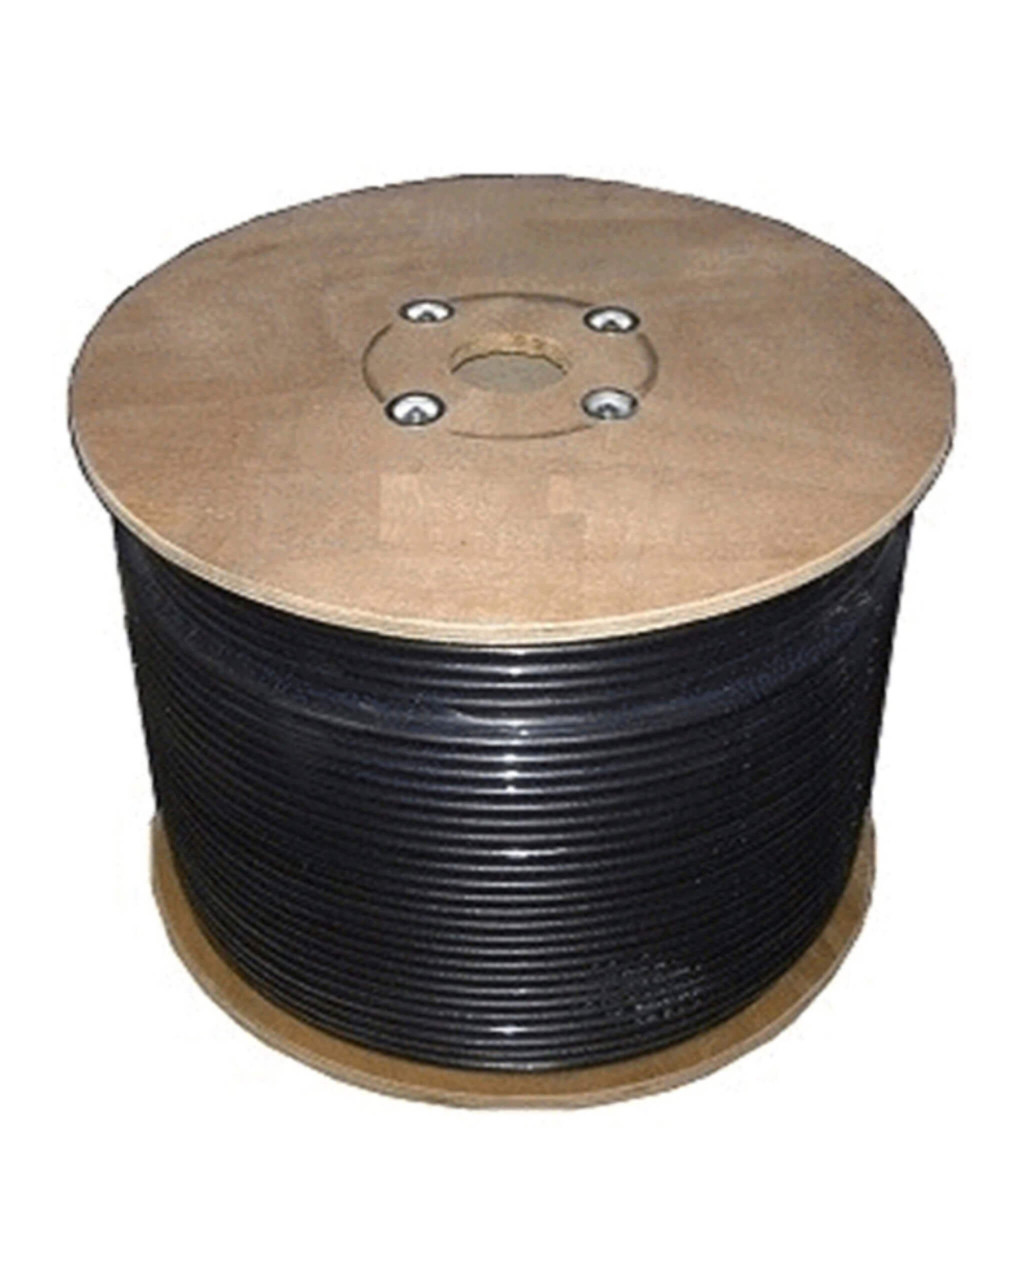 Bolton 400 Low Loss Cable - Black Color Spool No Connector 150m